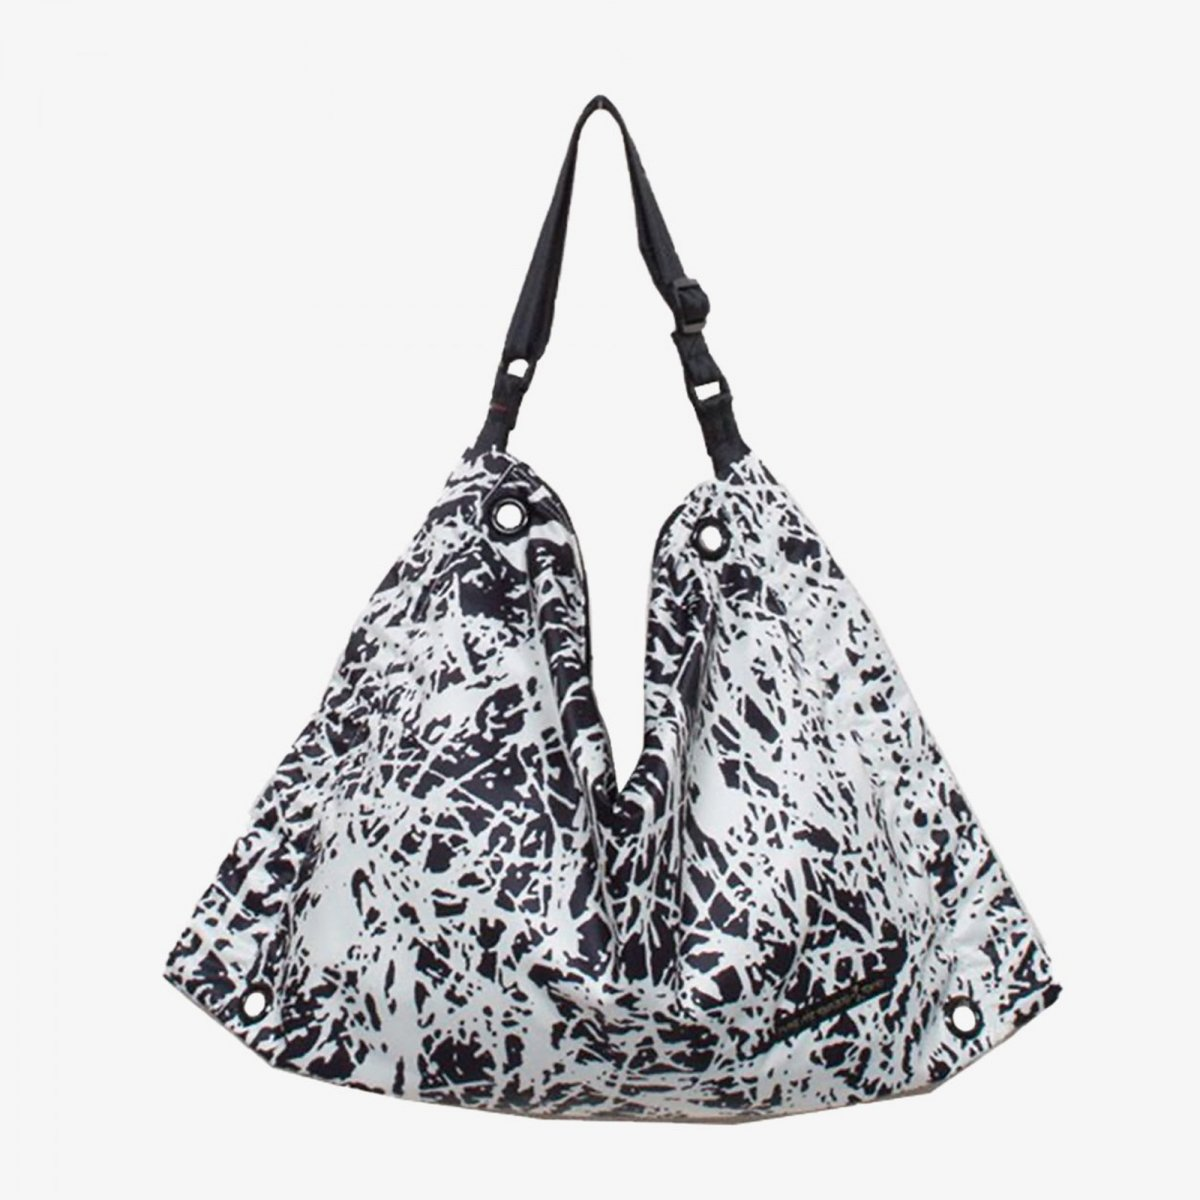 5a737acf46a5 ファスバッグ Lサイズ Grass(Black/White) - 軽いユニセックスのバッグ ...